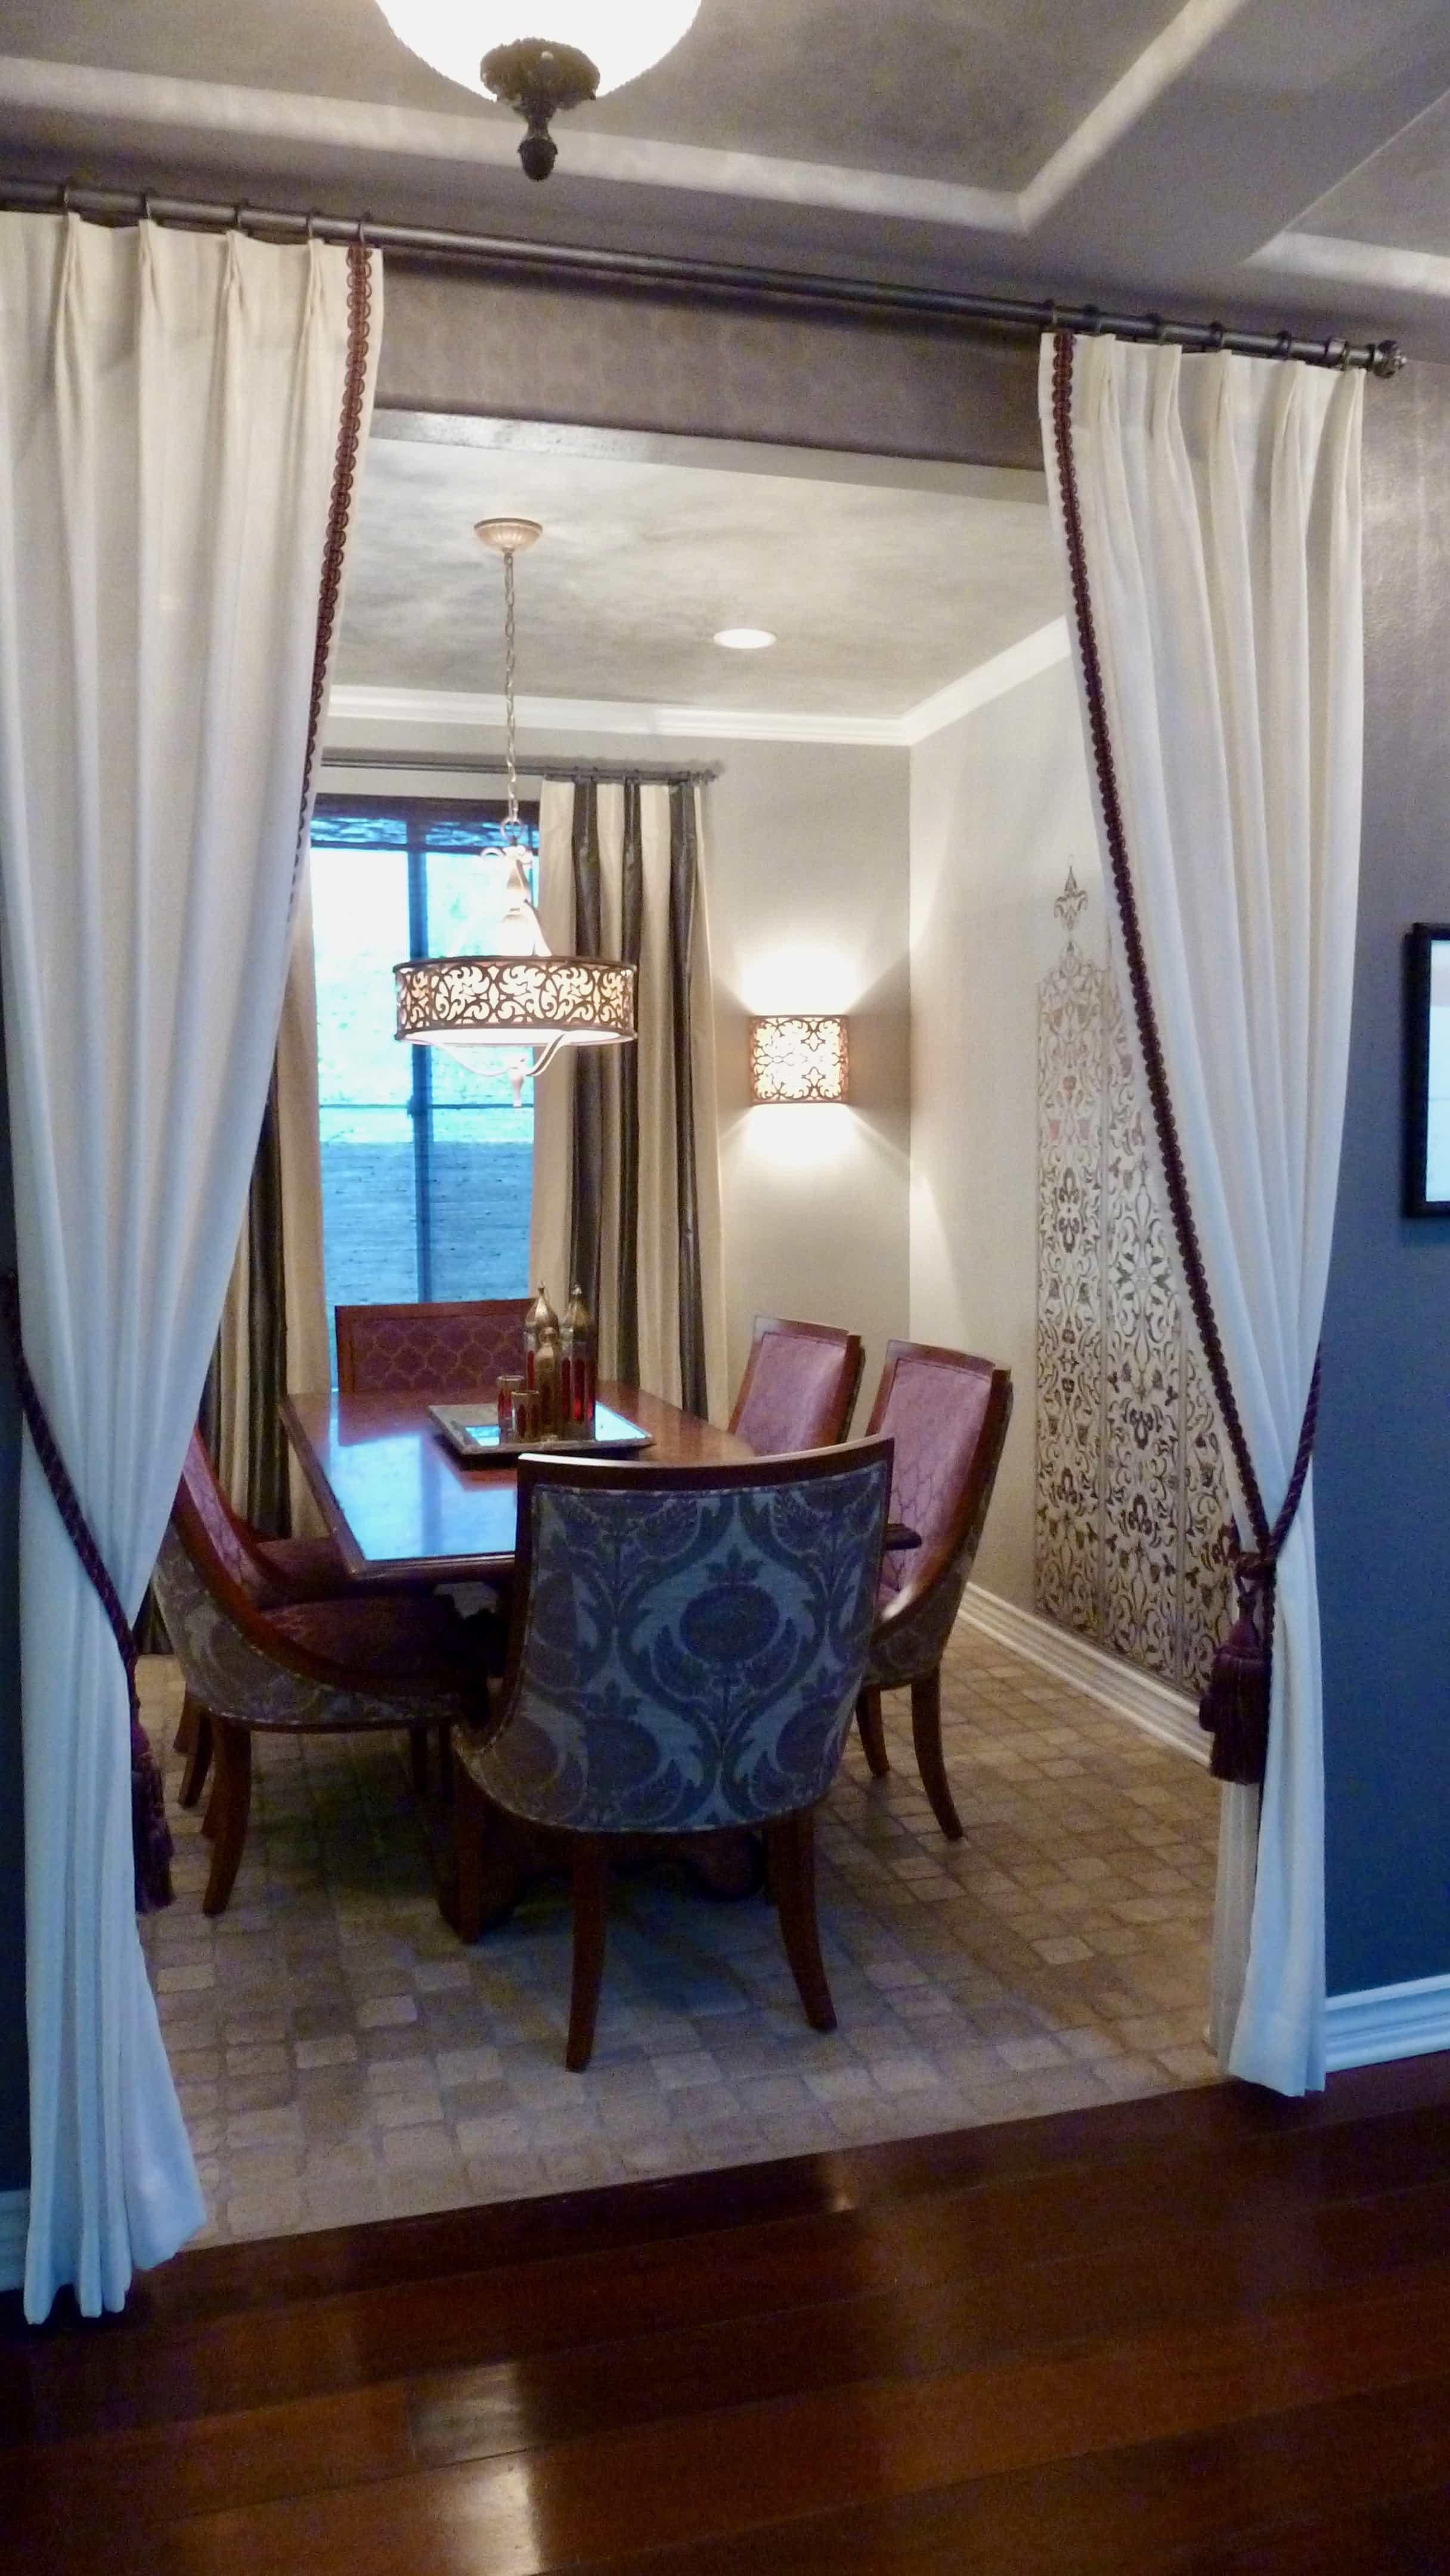 designer d winning design designs award commercial newtown designers county office fairfield ct interior apk s